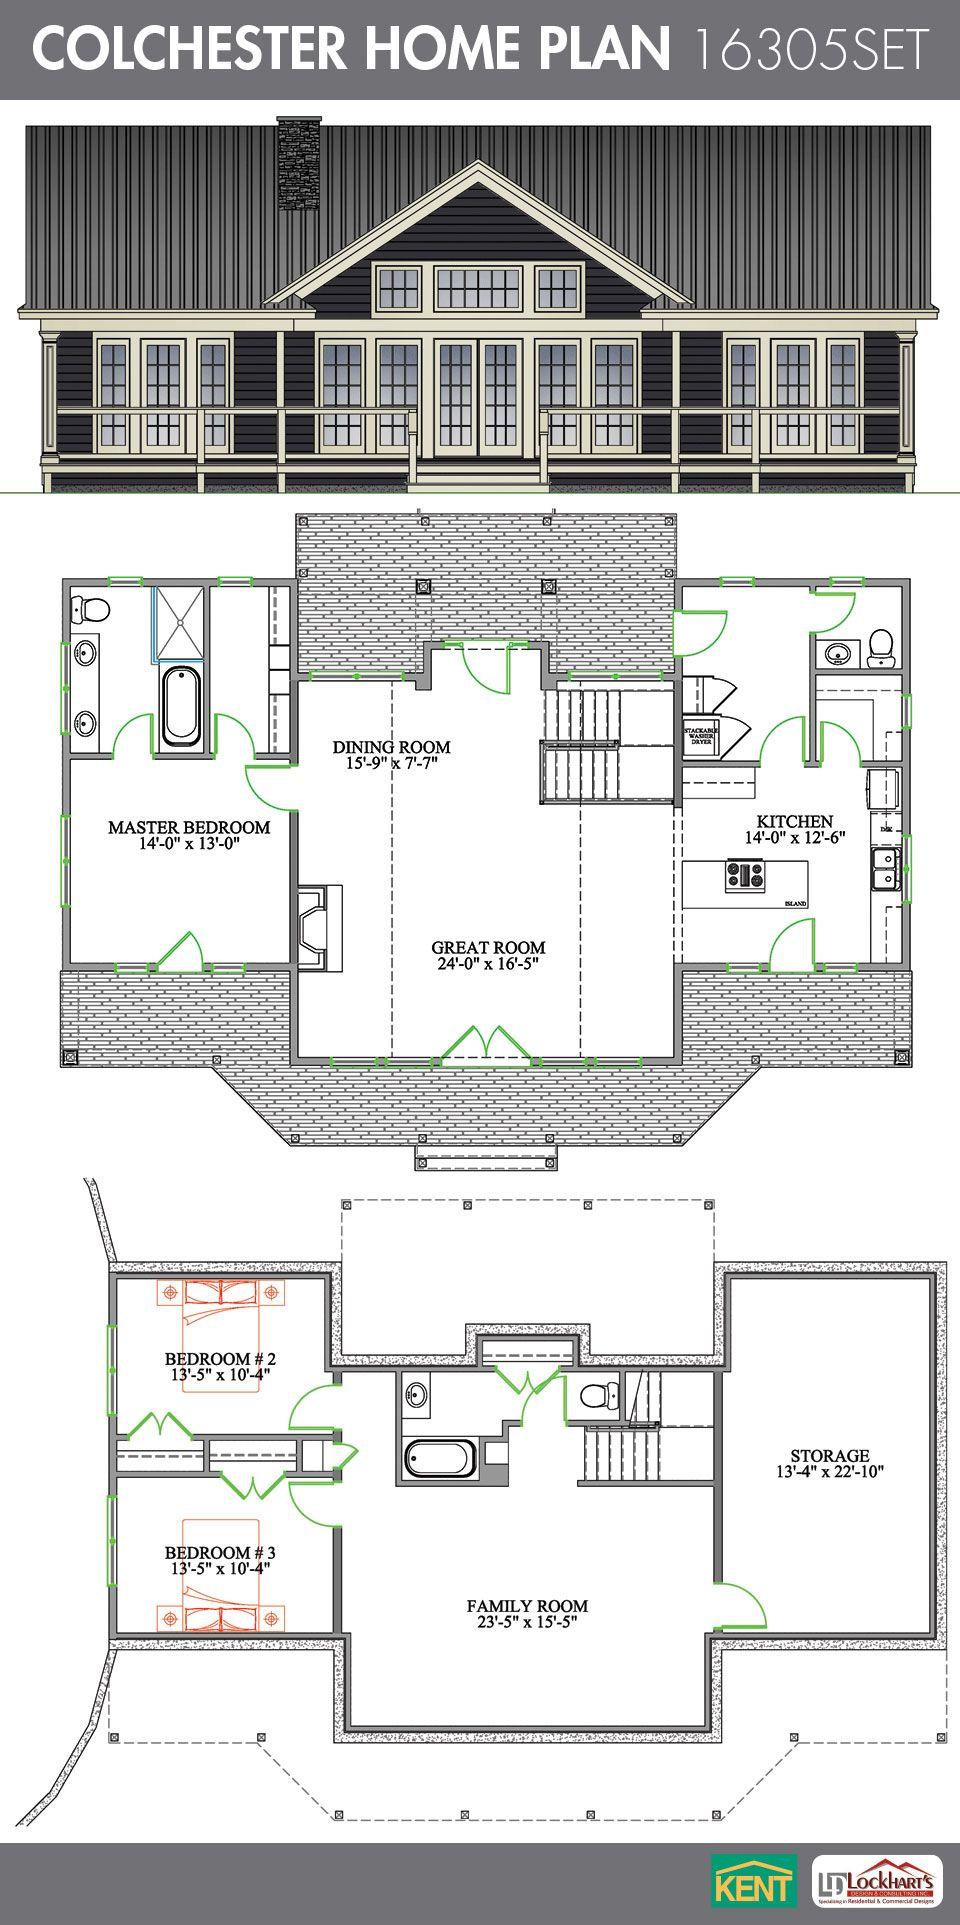 Colchester 3 bedroom 2 1 2 bath home plan Features open concept